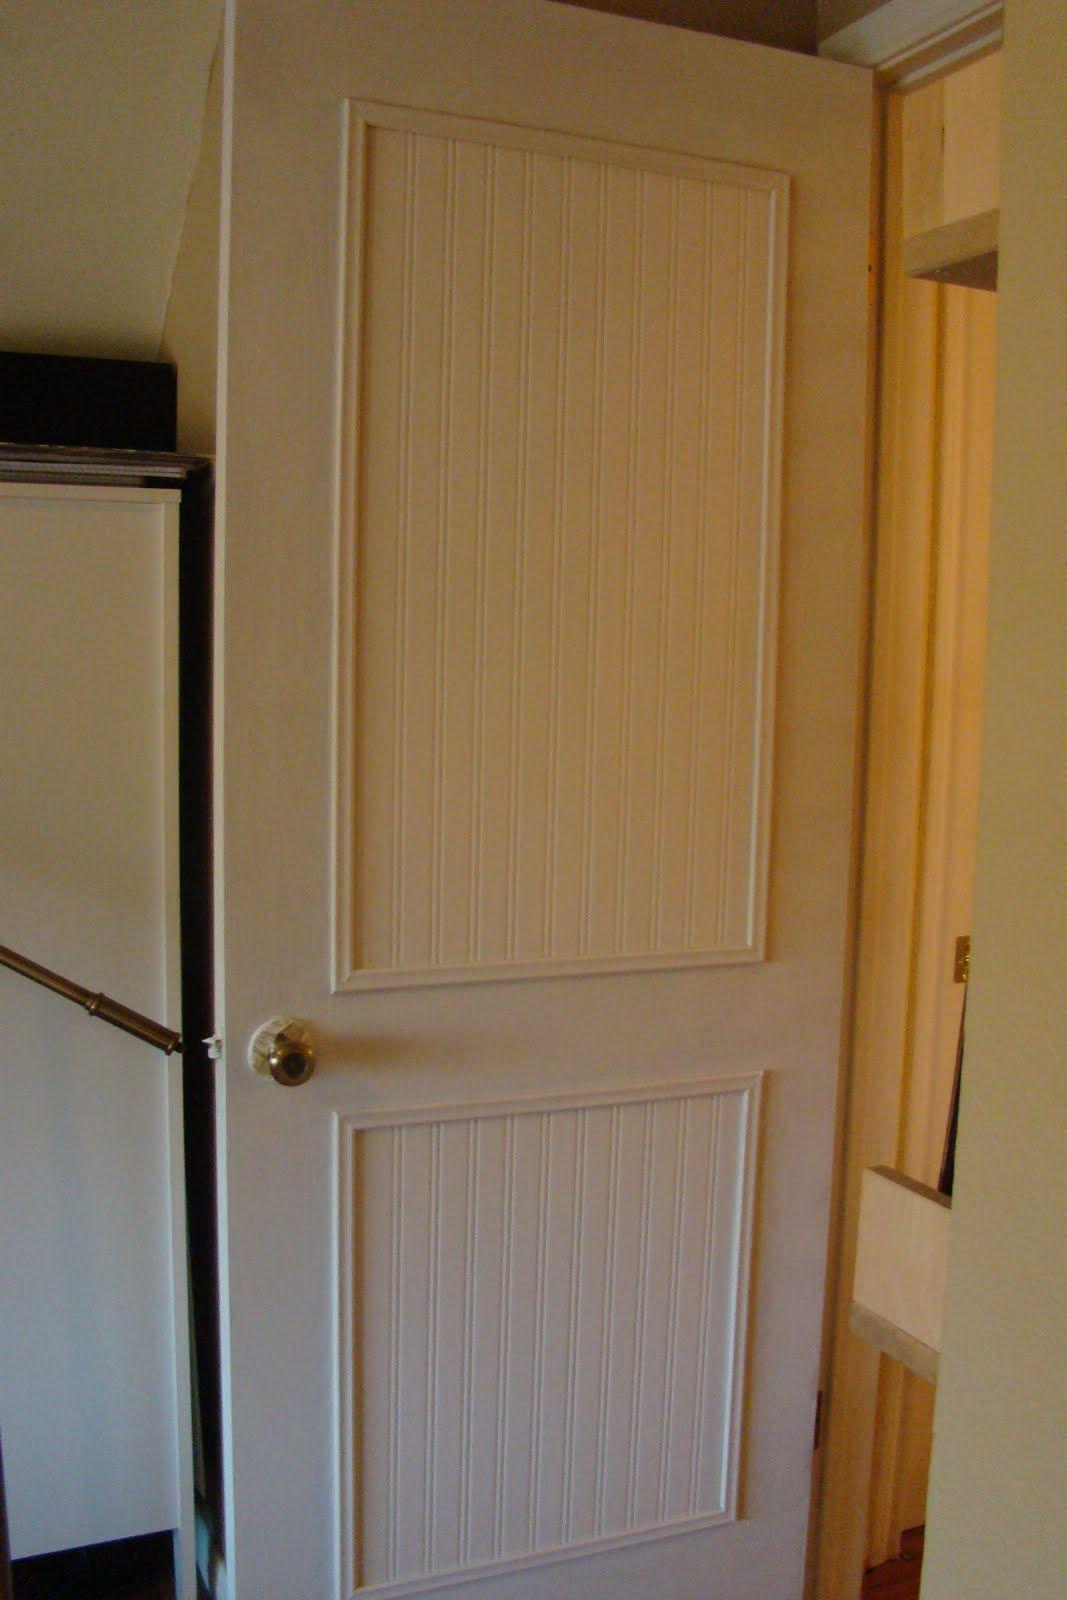 Diyのビーズボードパネルドア 室内ドアの壁紙 736x1103 Wallpapertip